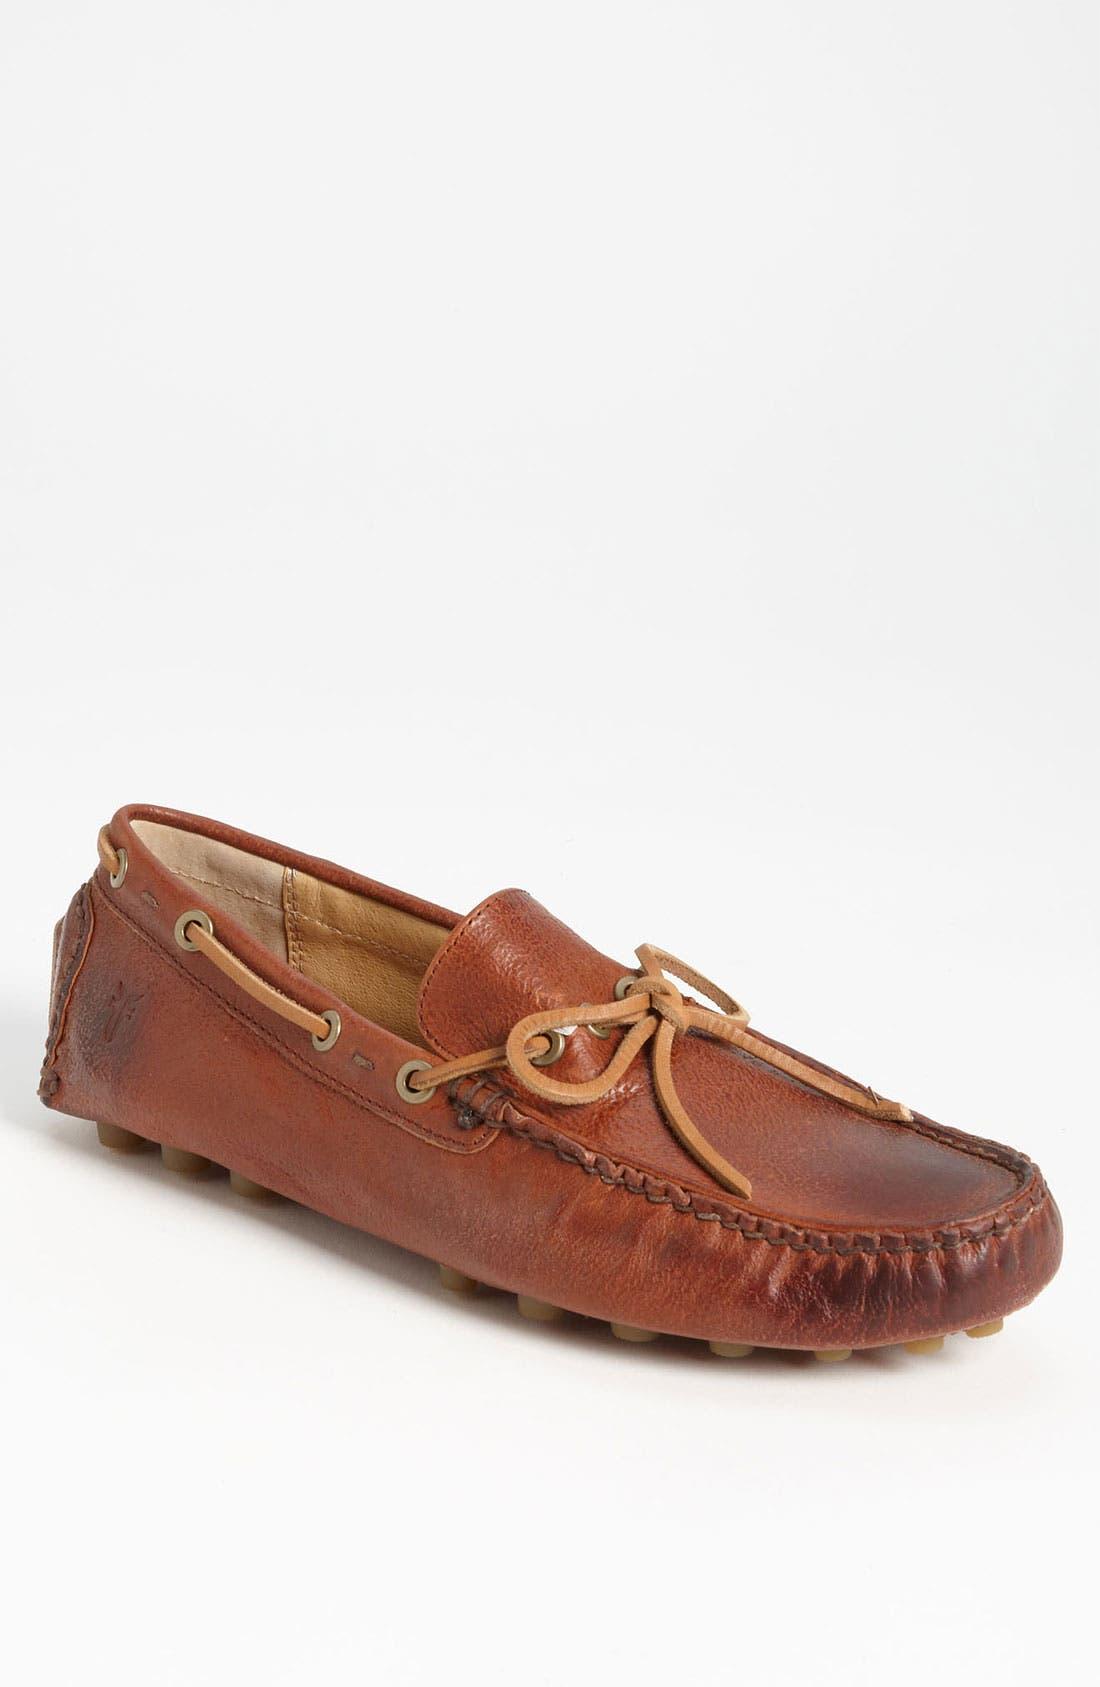 Alternate Image 1 Selected - Frye 'Russel' Driving Shoe